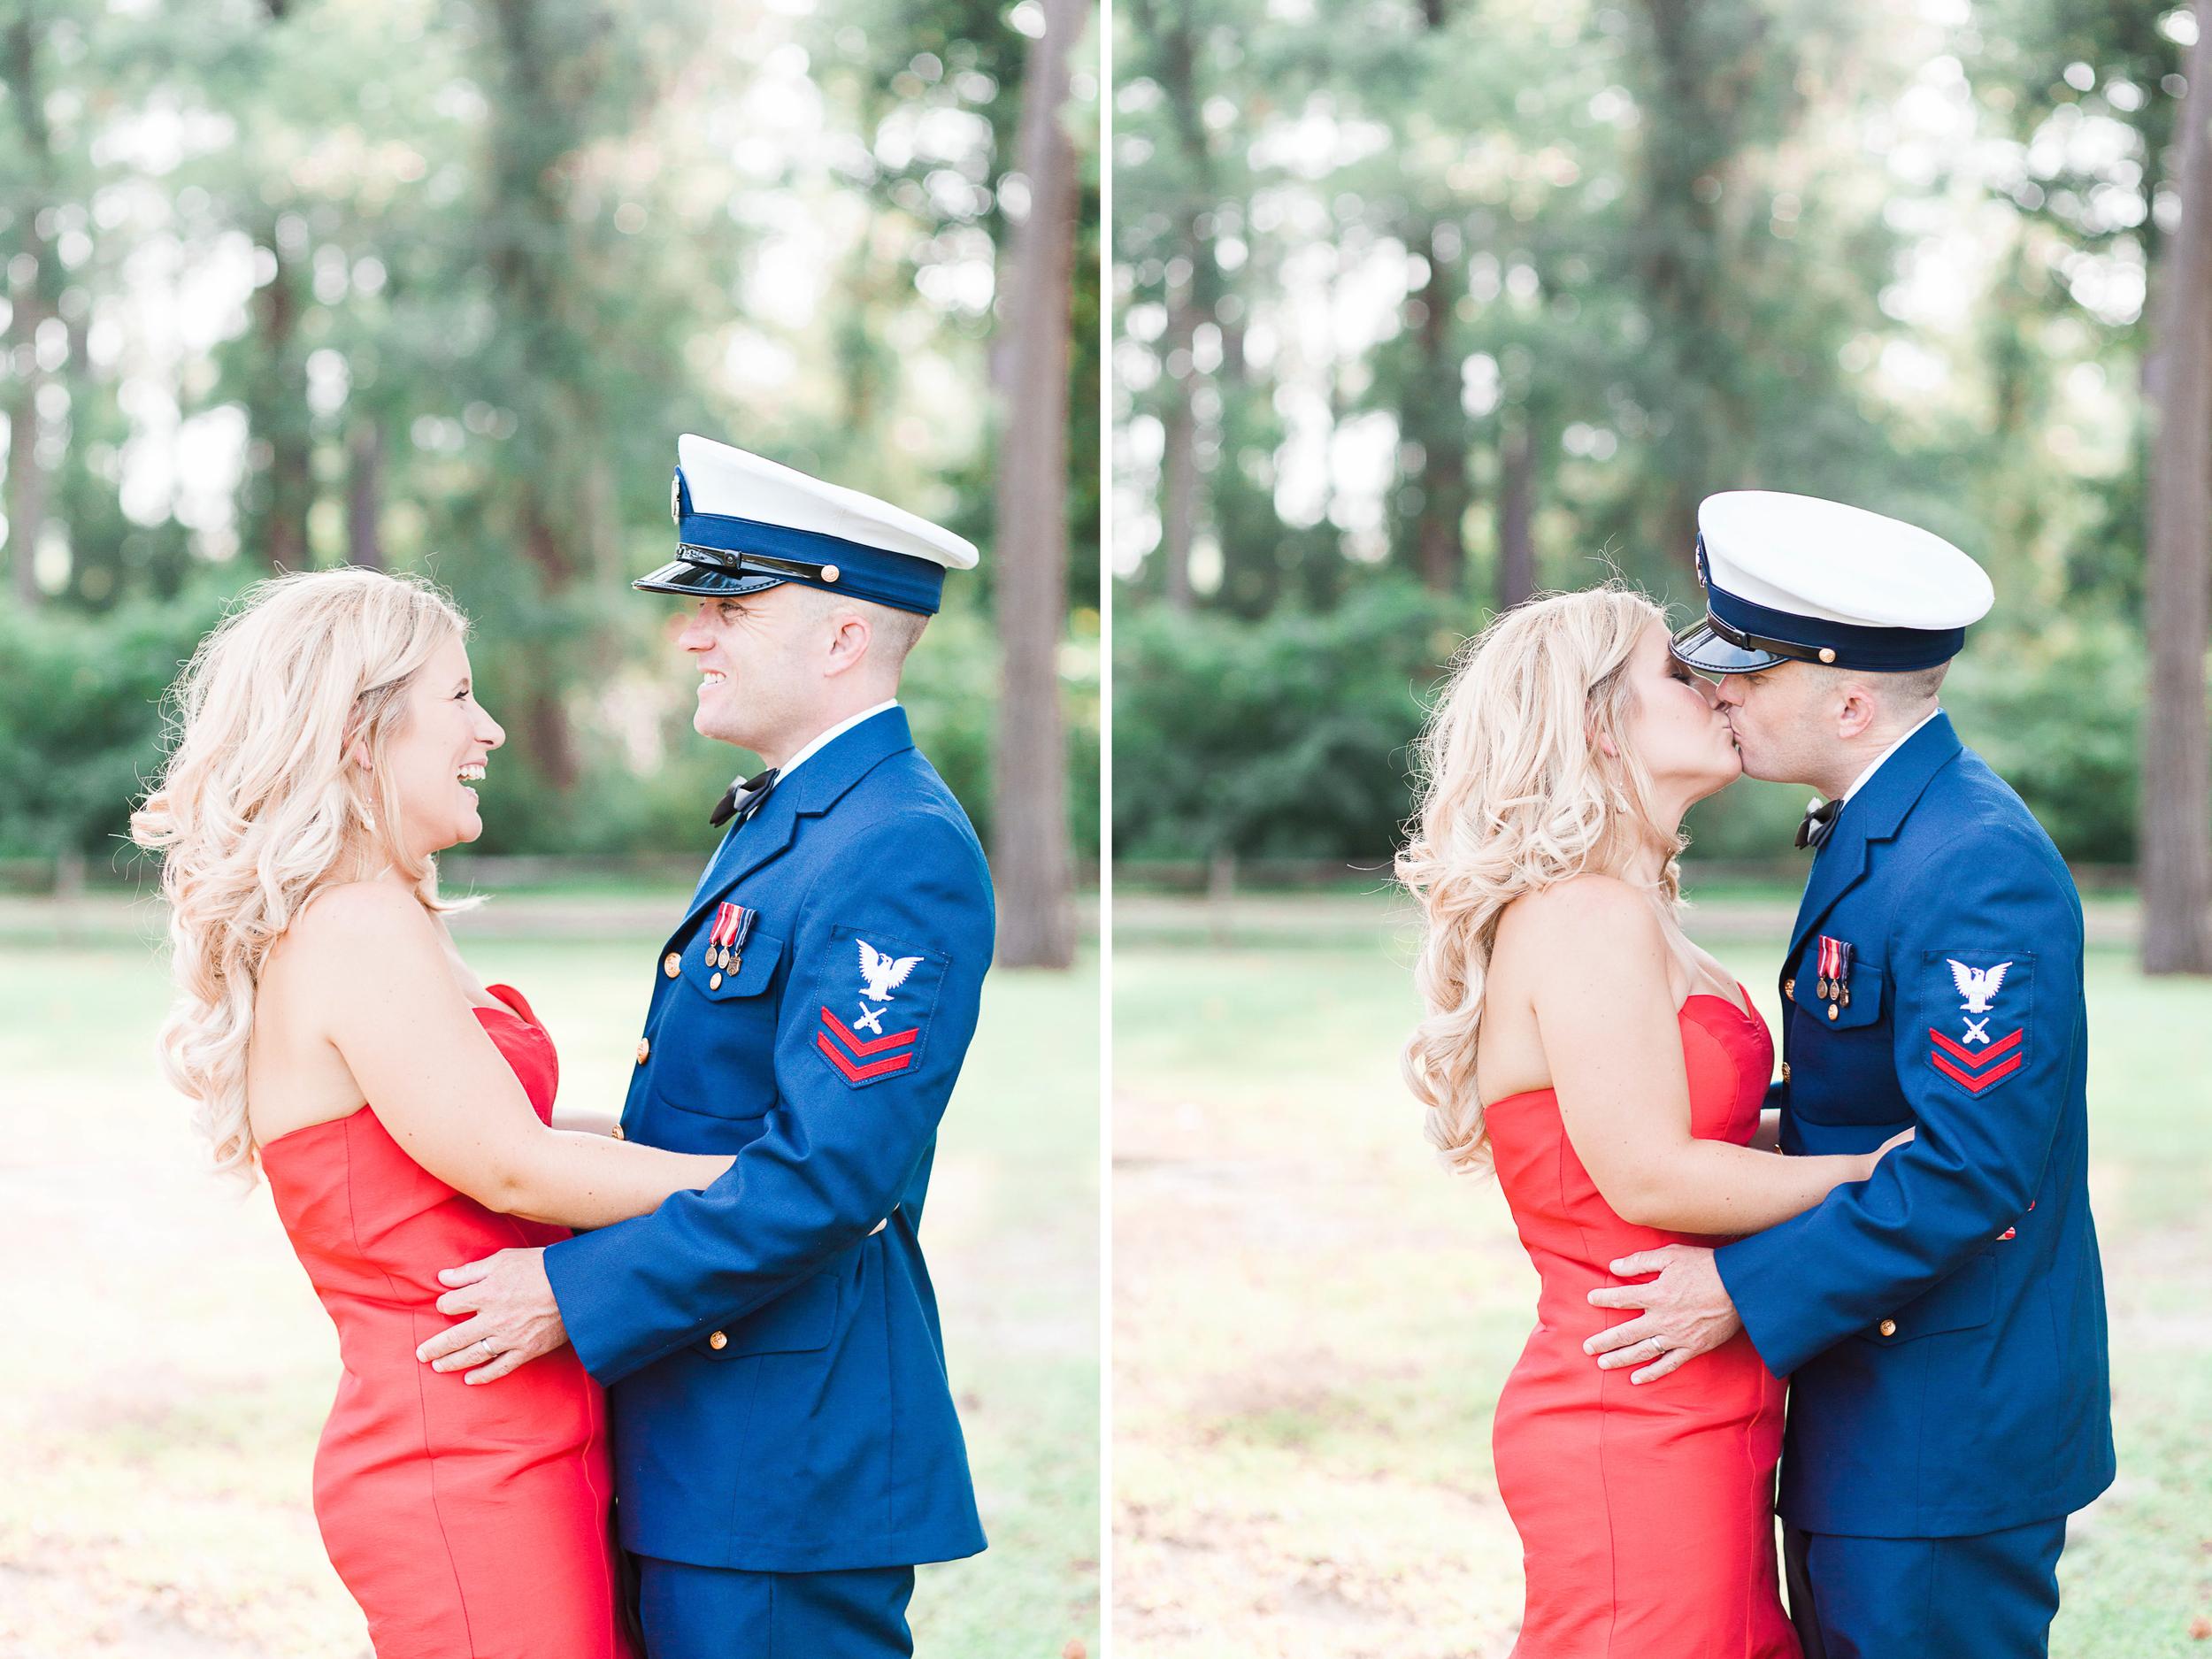 Jacksonville NC Photographer - Wynona Benson Photography - Military Gallery - 05.jpg